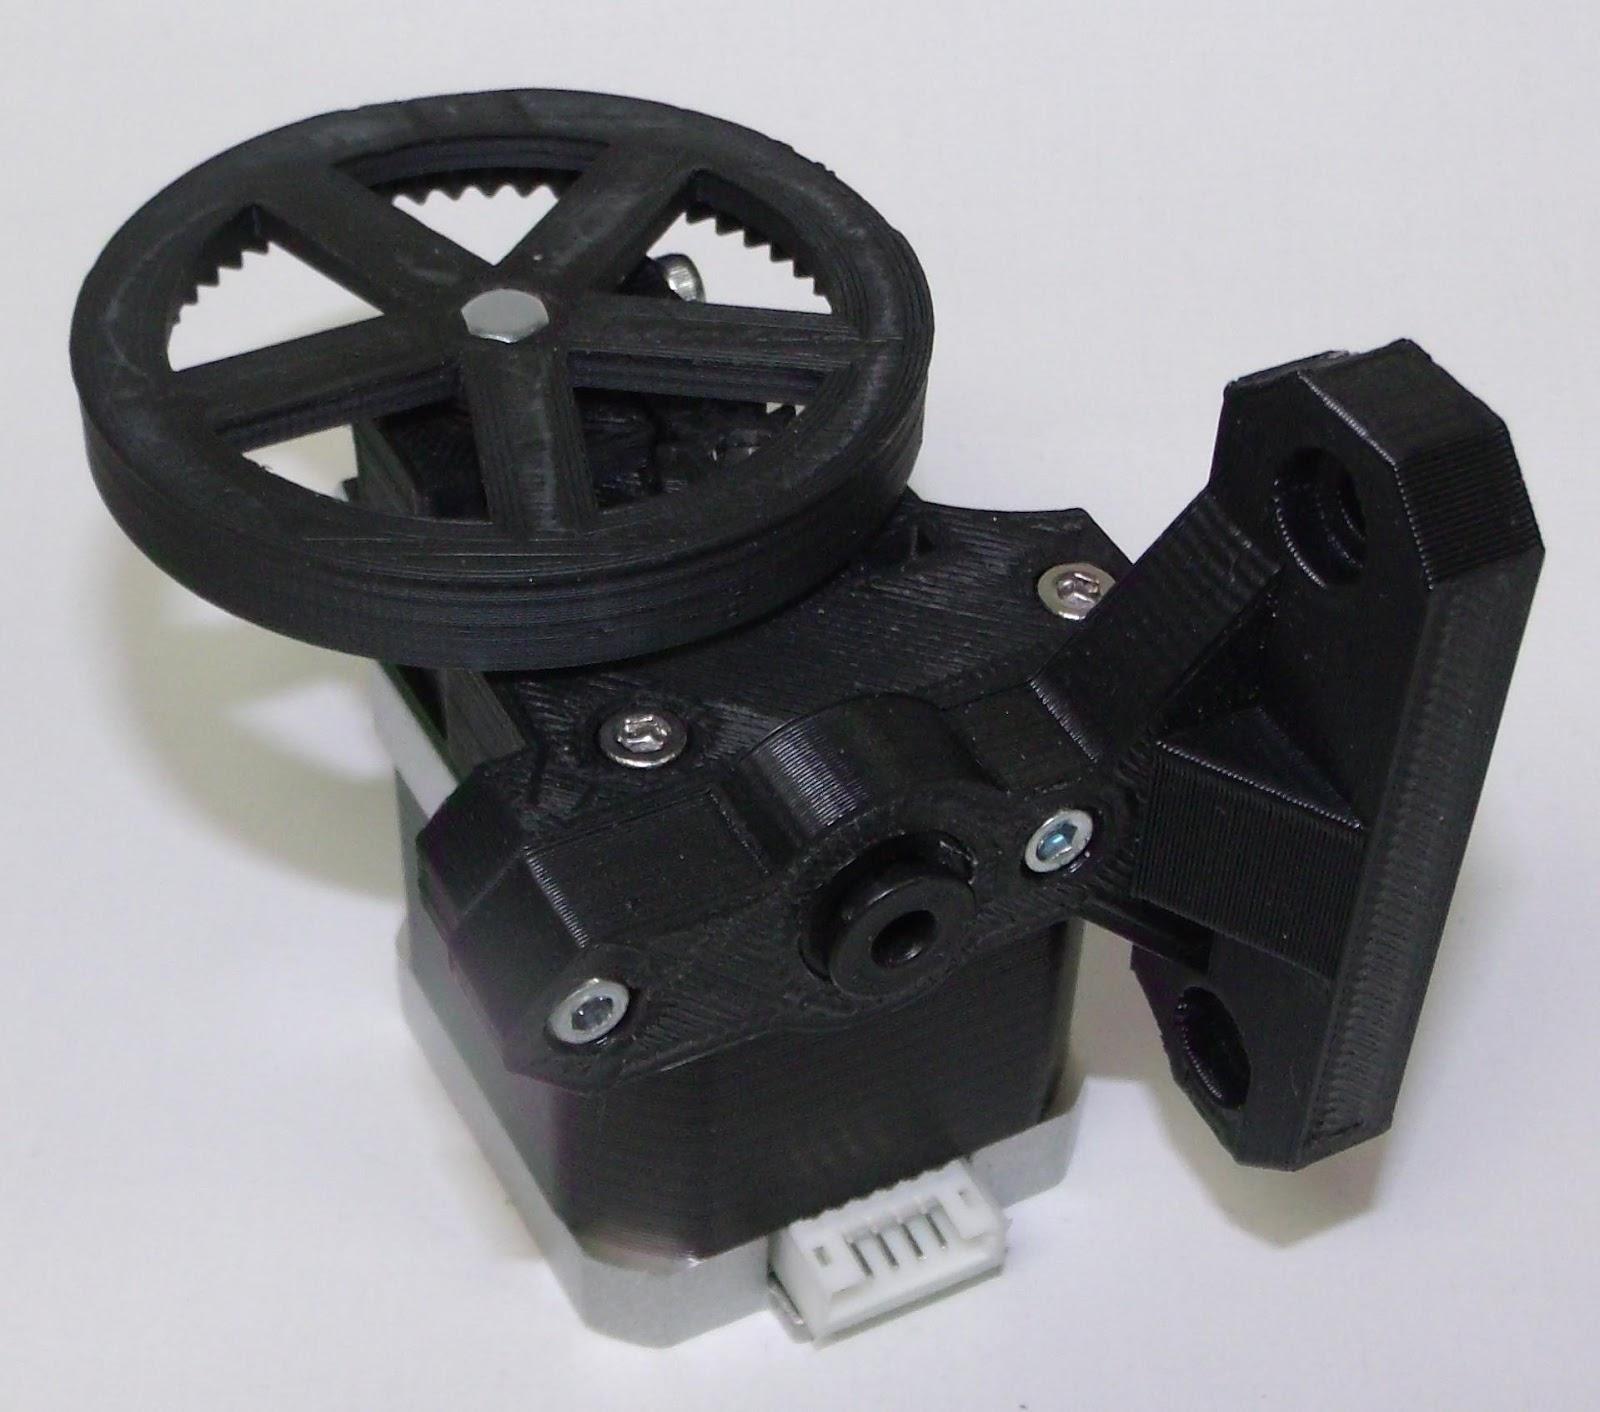 Extruder-new-mount-pushfit.JPG